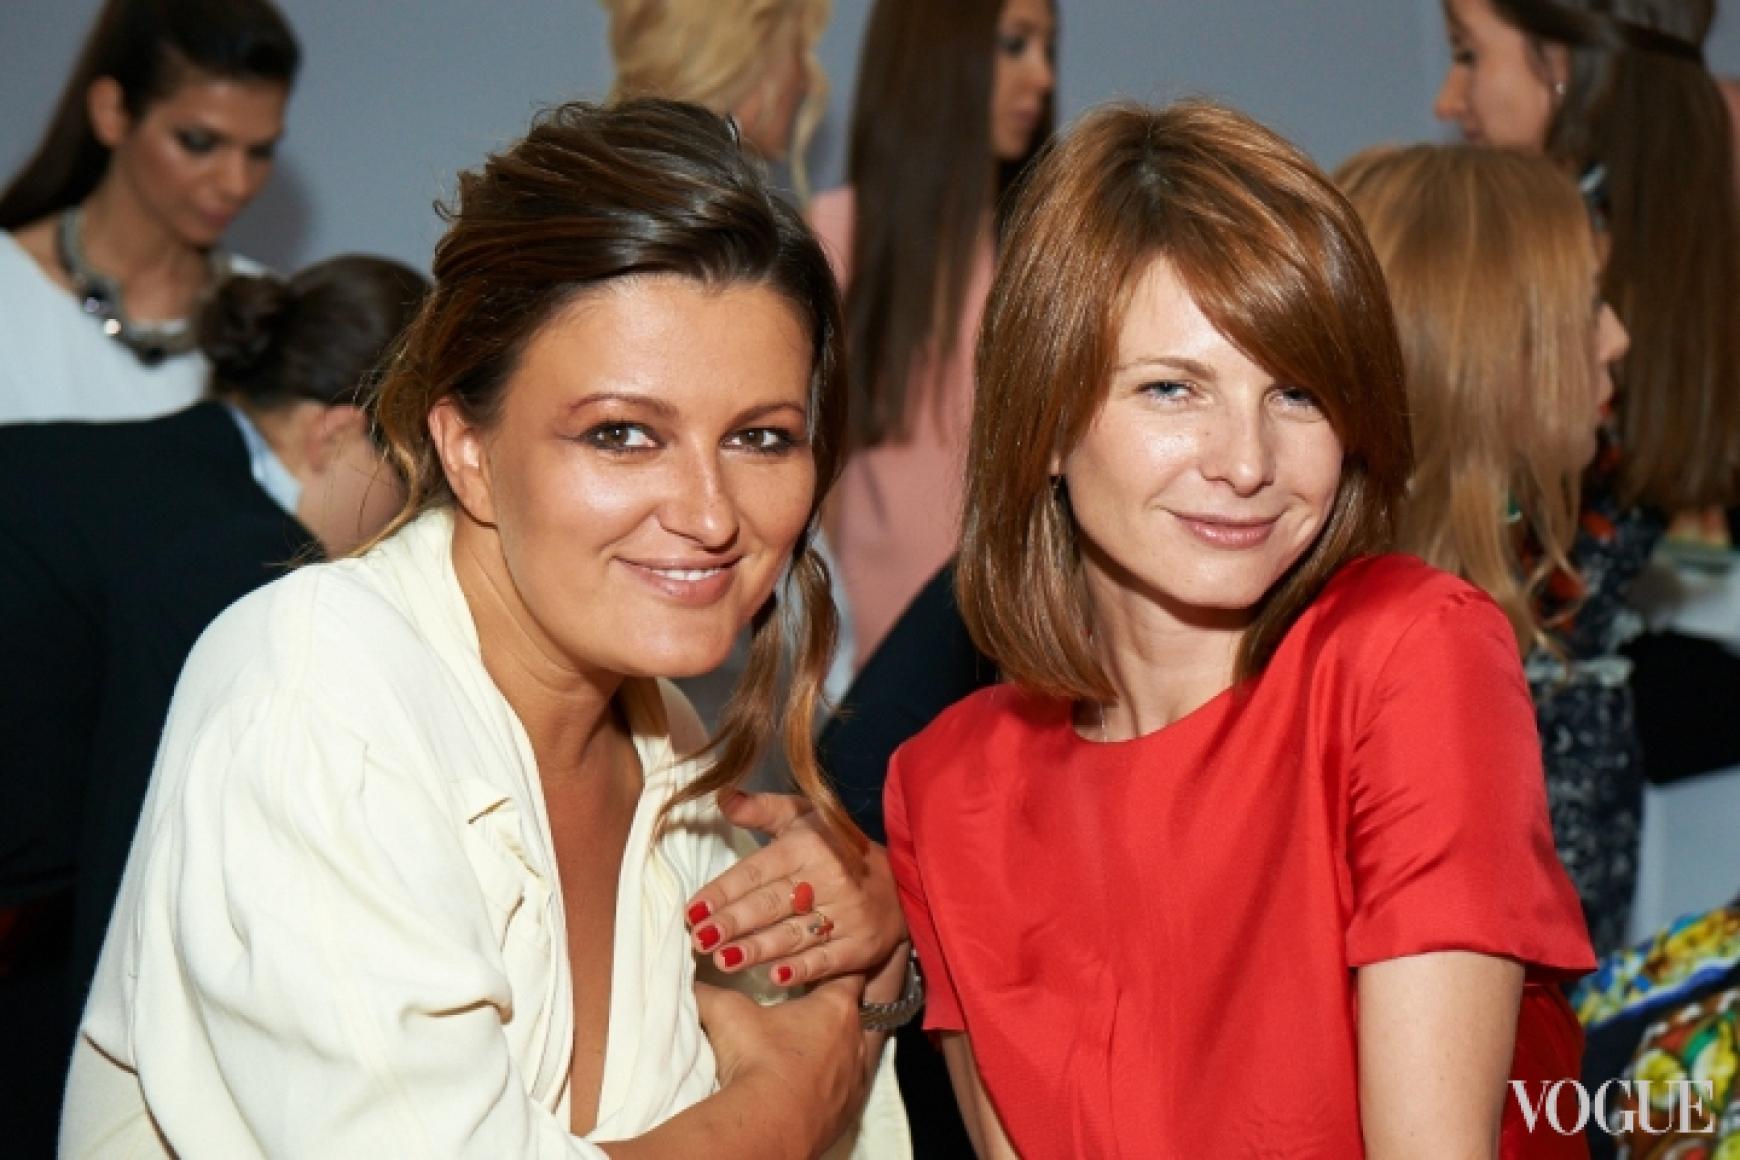 Мария Шубина и Екатерина Кулик